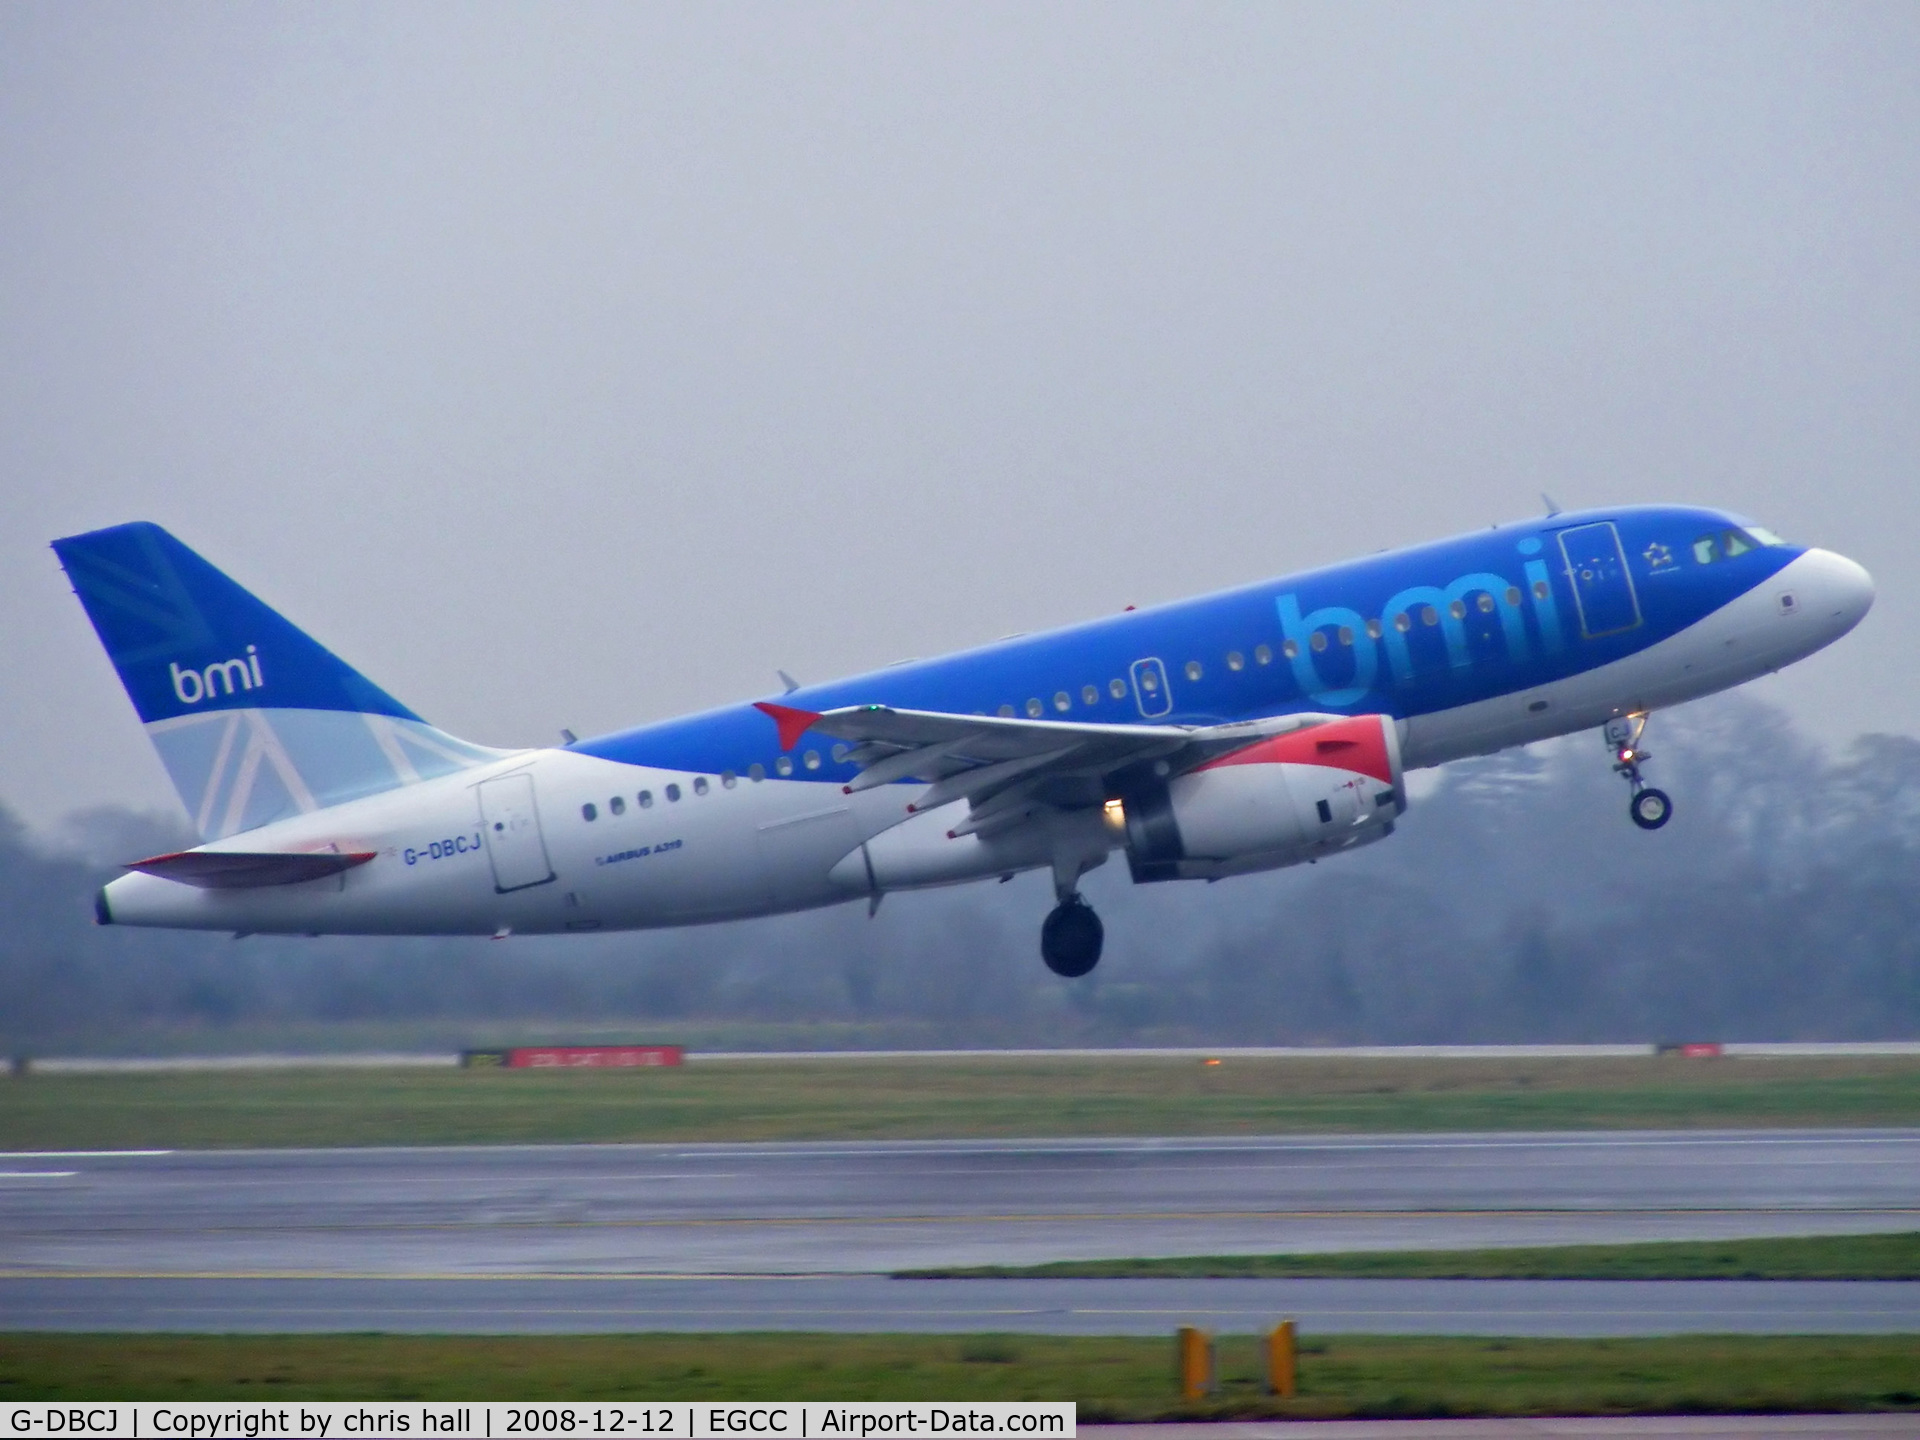 G-DBCJ, 2006 Airbus A319-131 C/N 2981, BMI